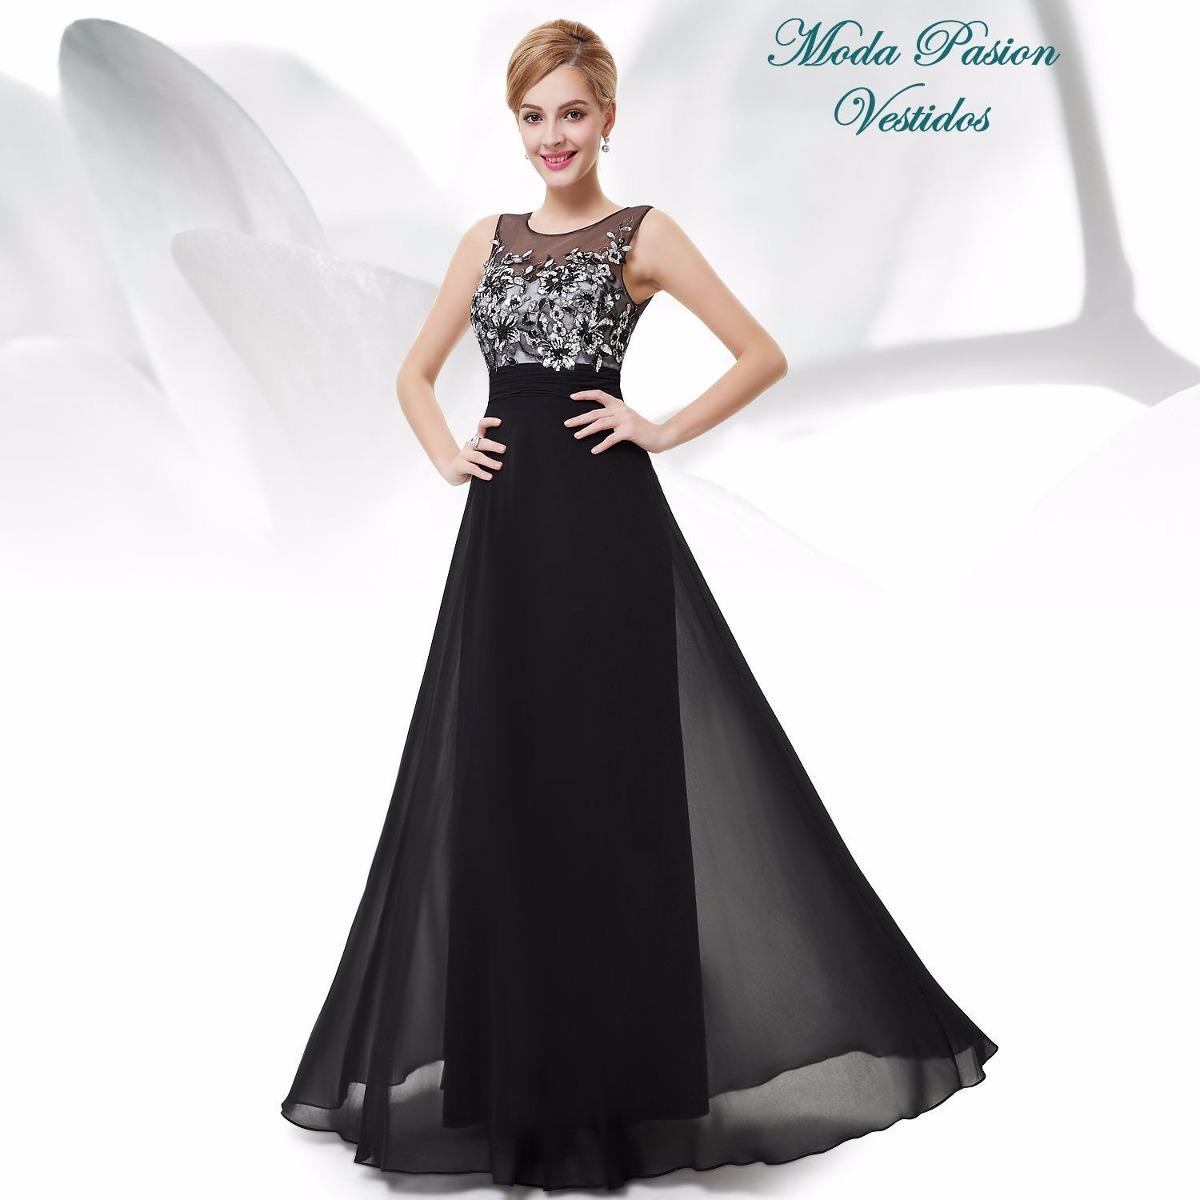 Modas de vestidos para madrinas de boda